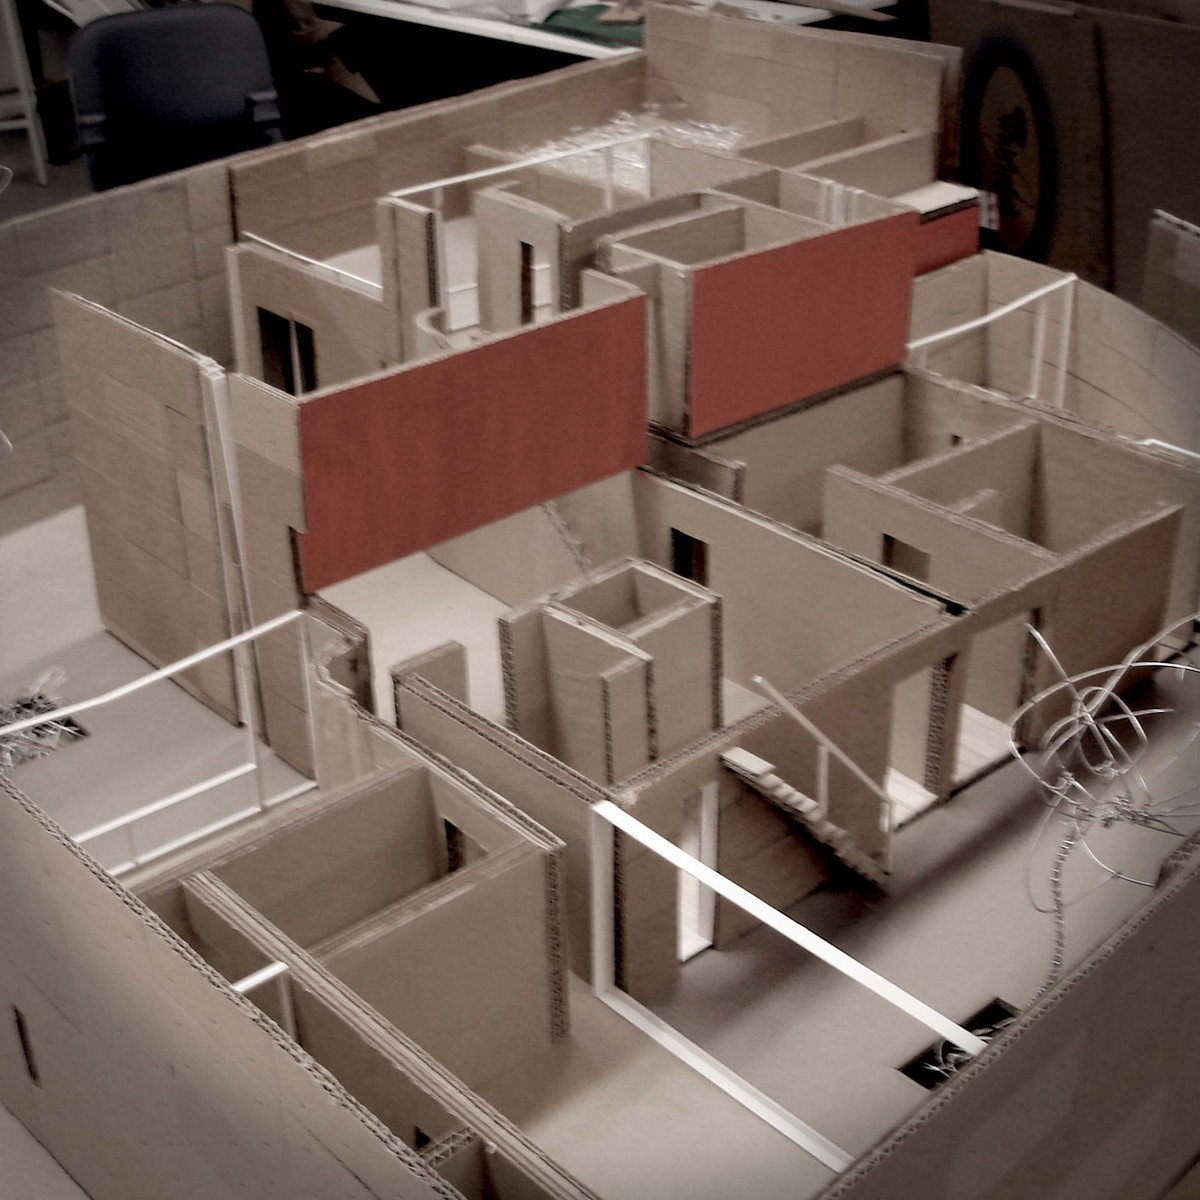 Cardboard model house